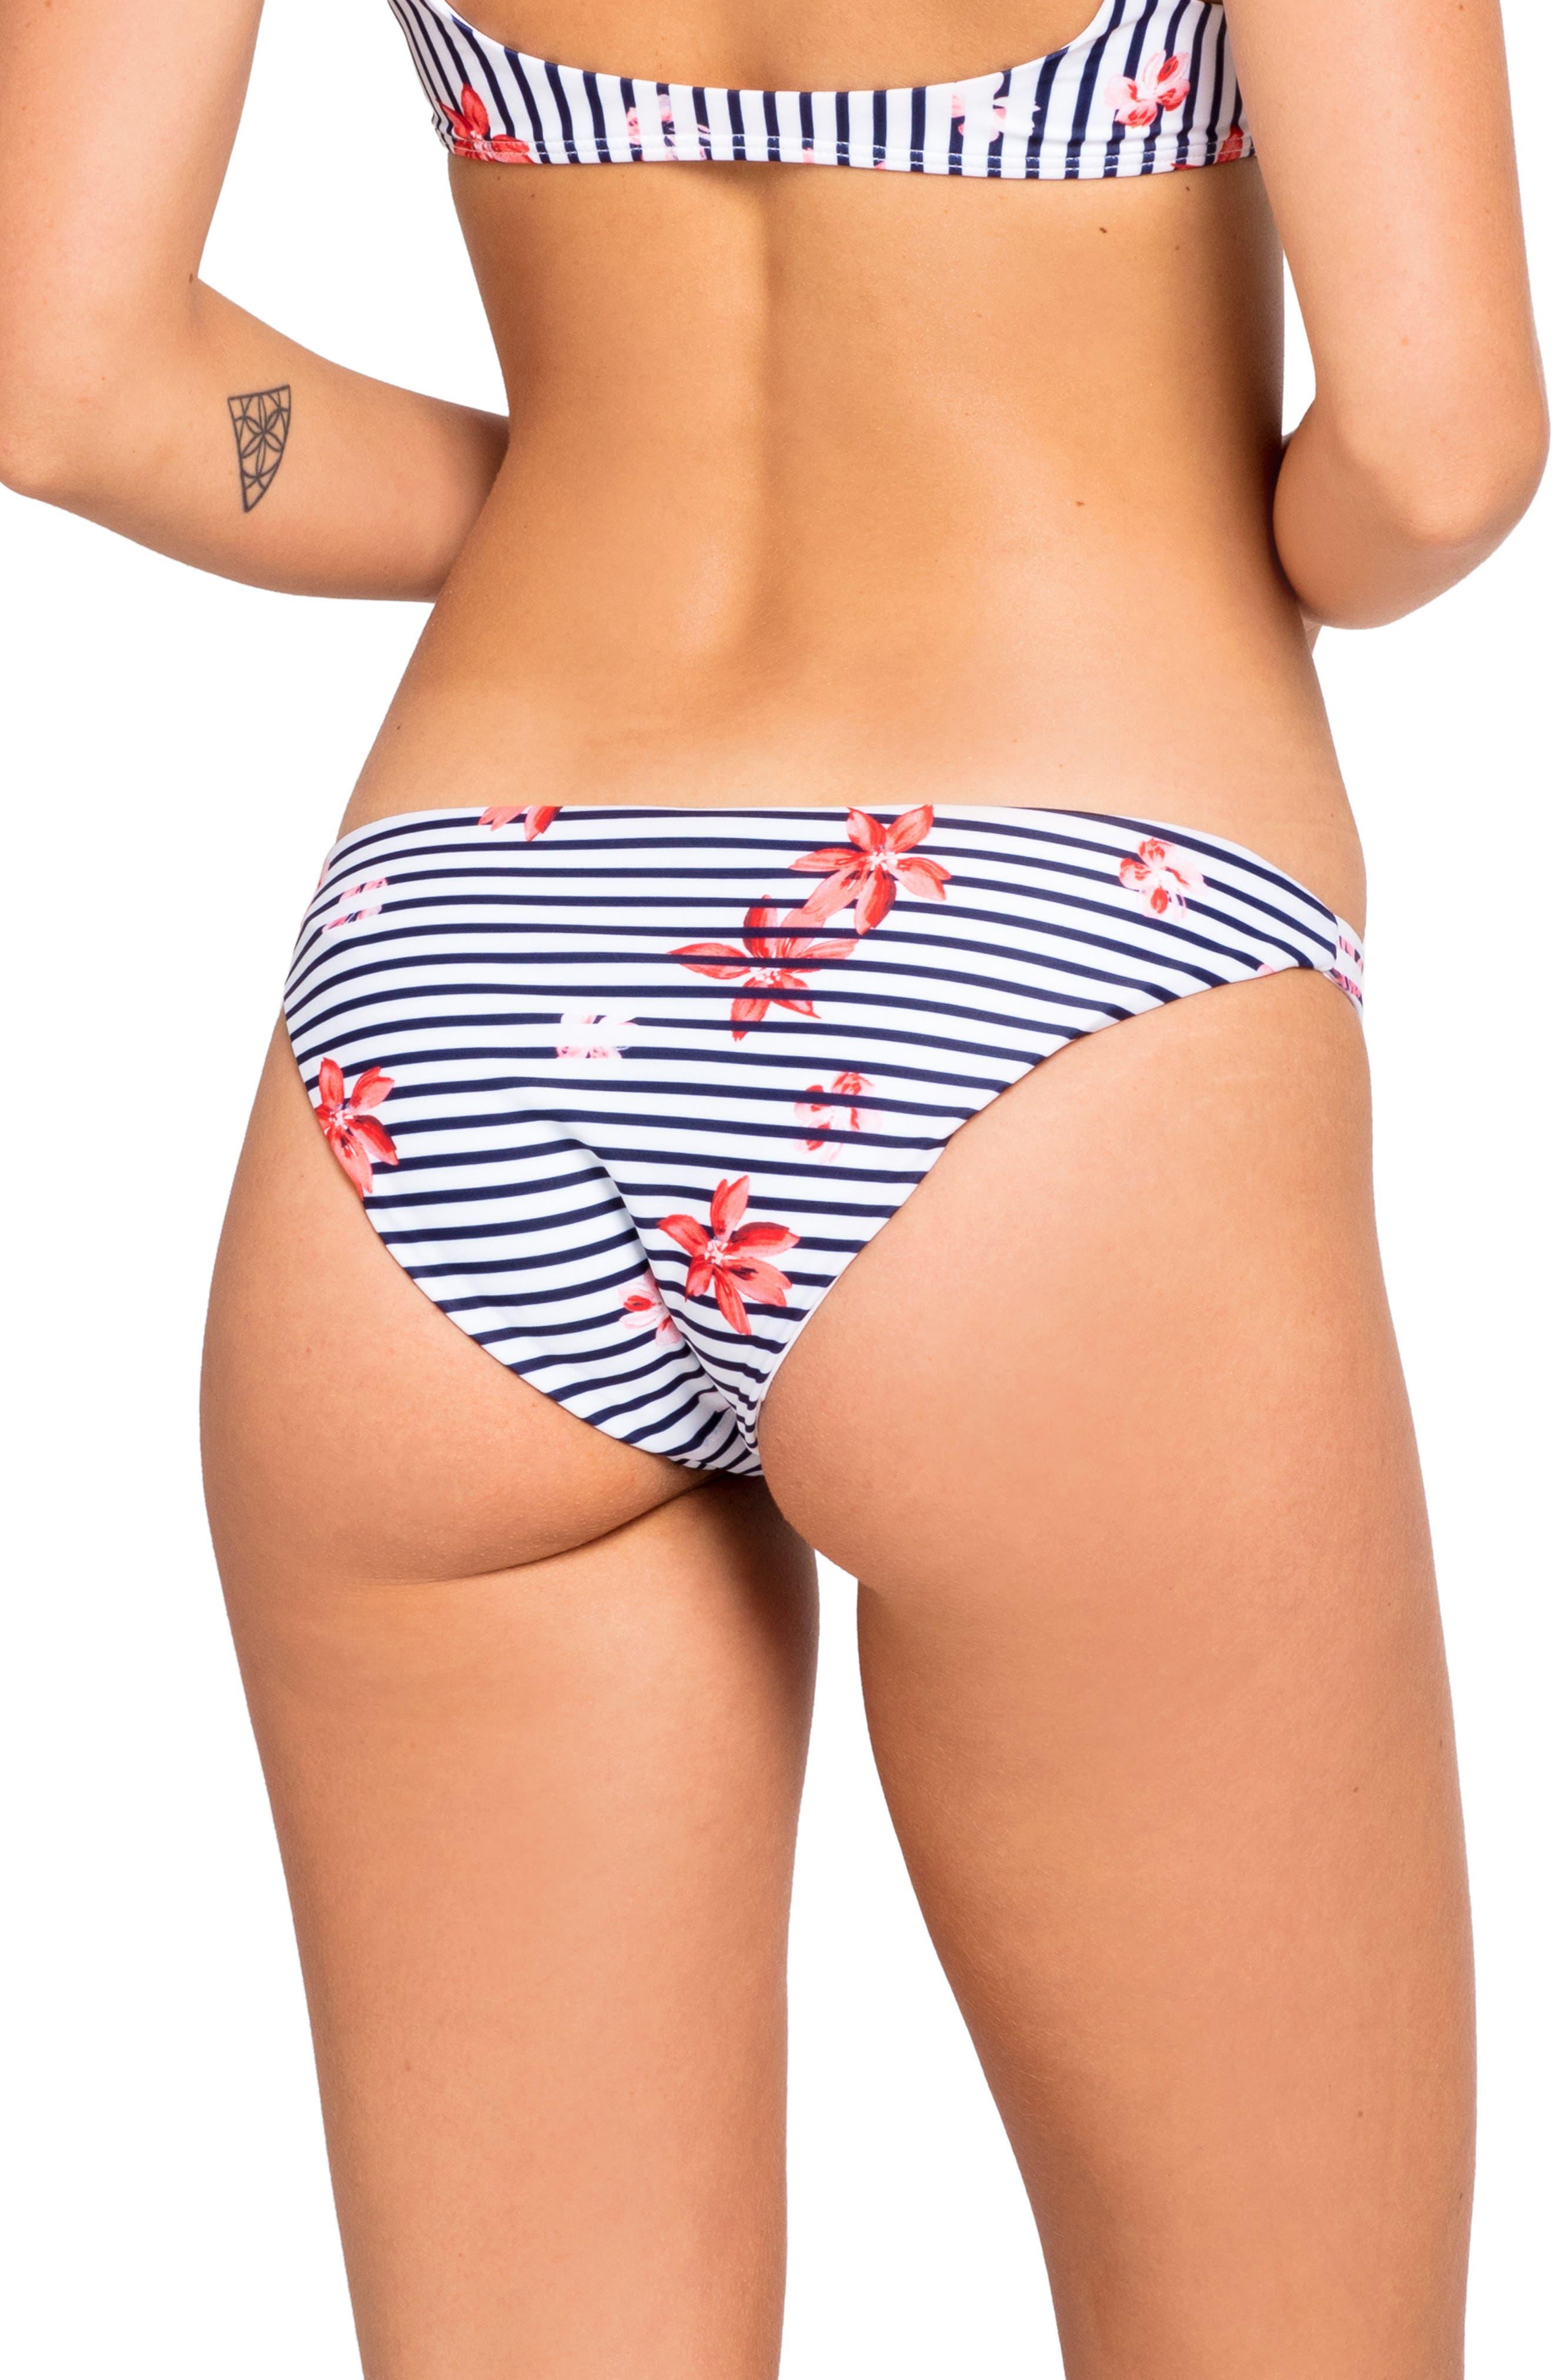 Camacho Hipster Bikini Bottoms,                             Alternate thumbnail 2, color,                             FLORAL BAY